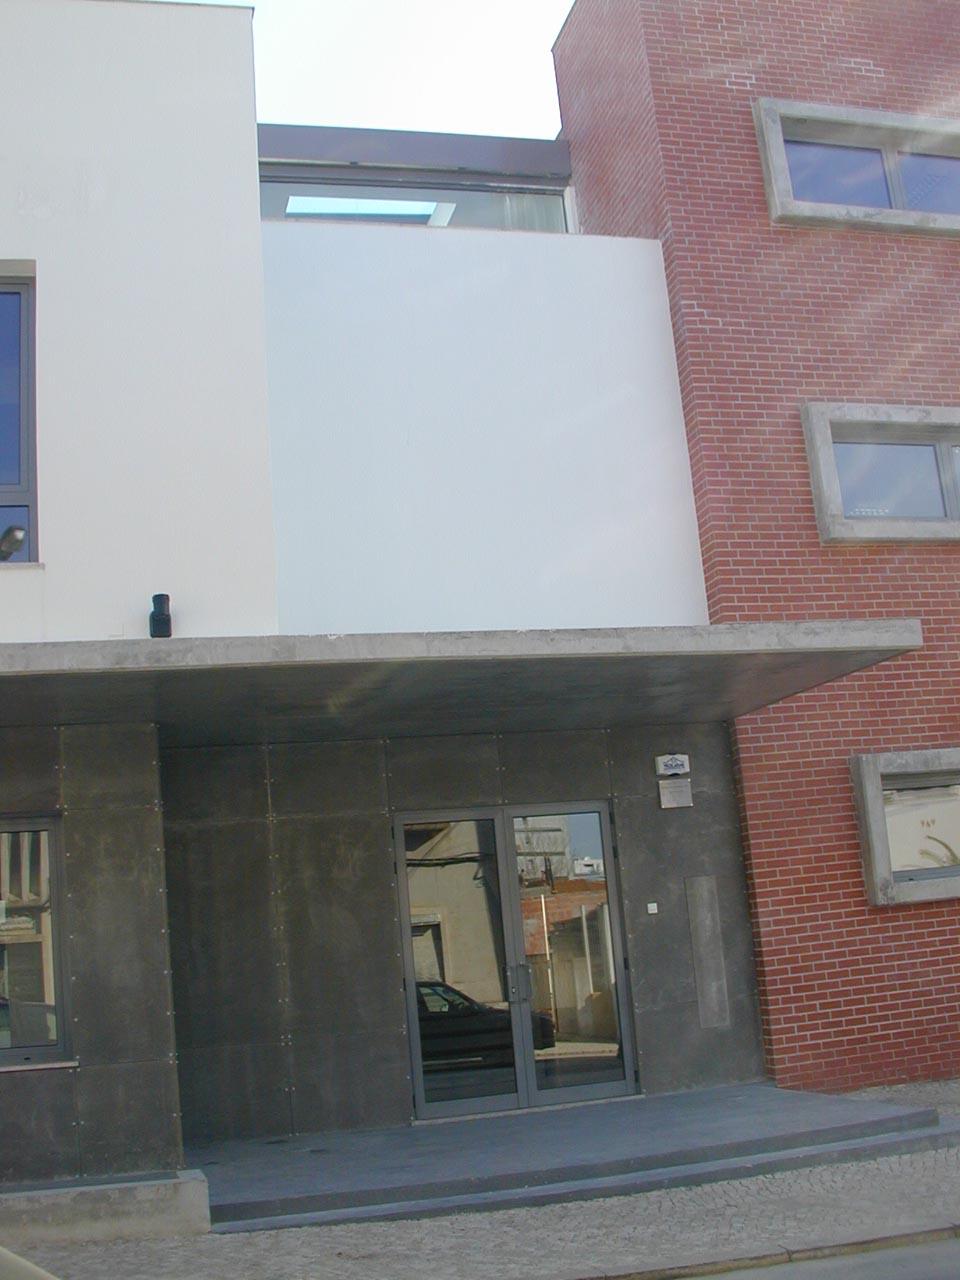 https://www.araujo-arquitectura.pt/wp-content/uploads/2020/12/DSCN0032.jpg